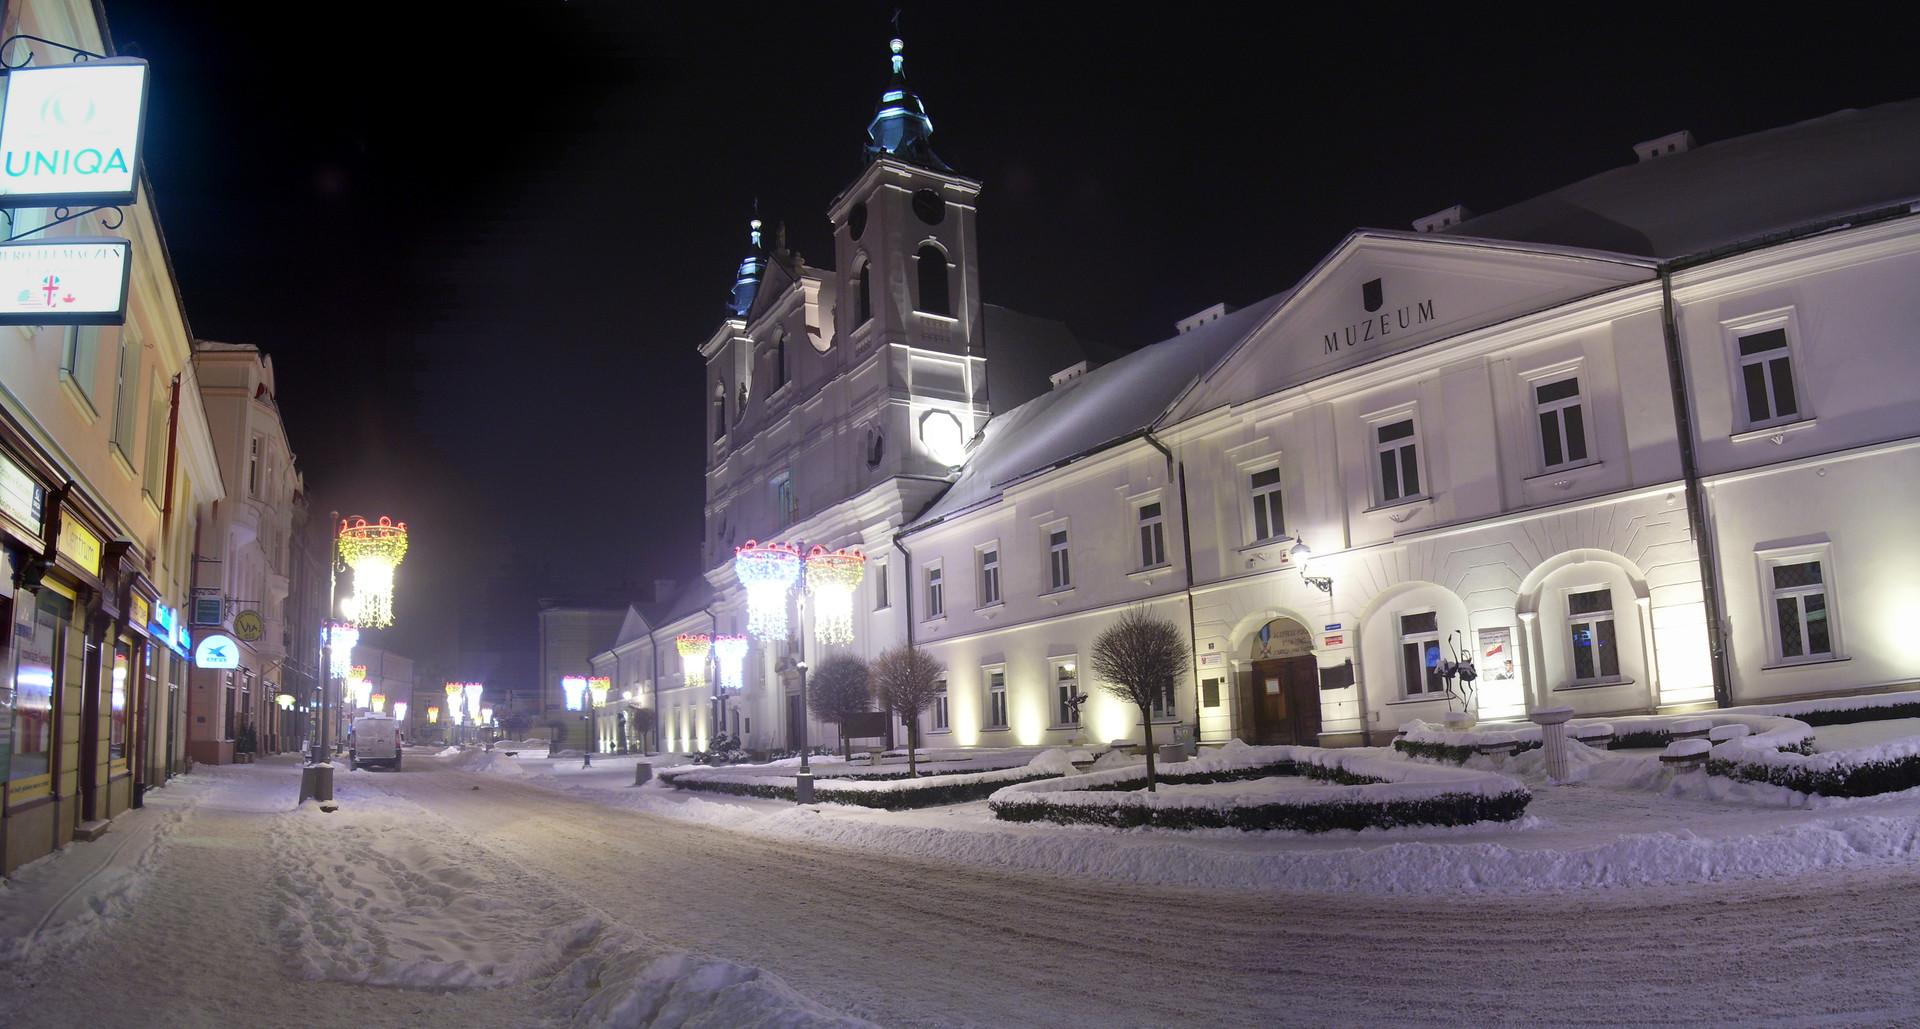 Esperienza Erasmus a Rzeszow, Polonia di Enes